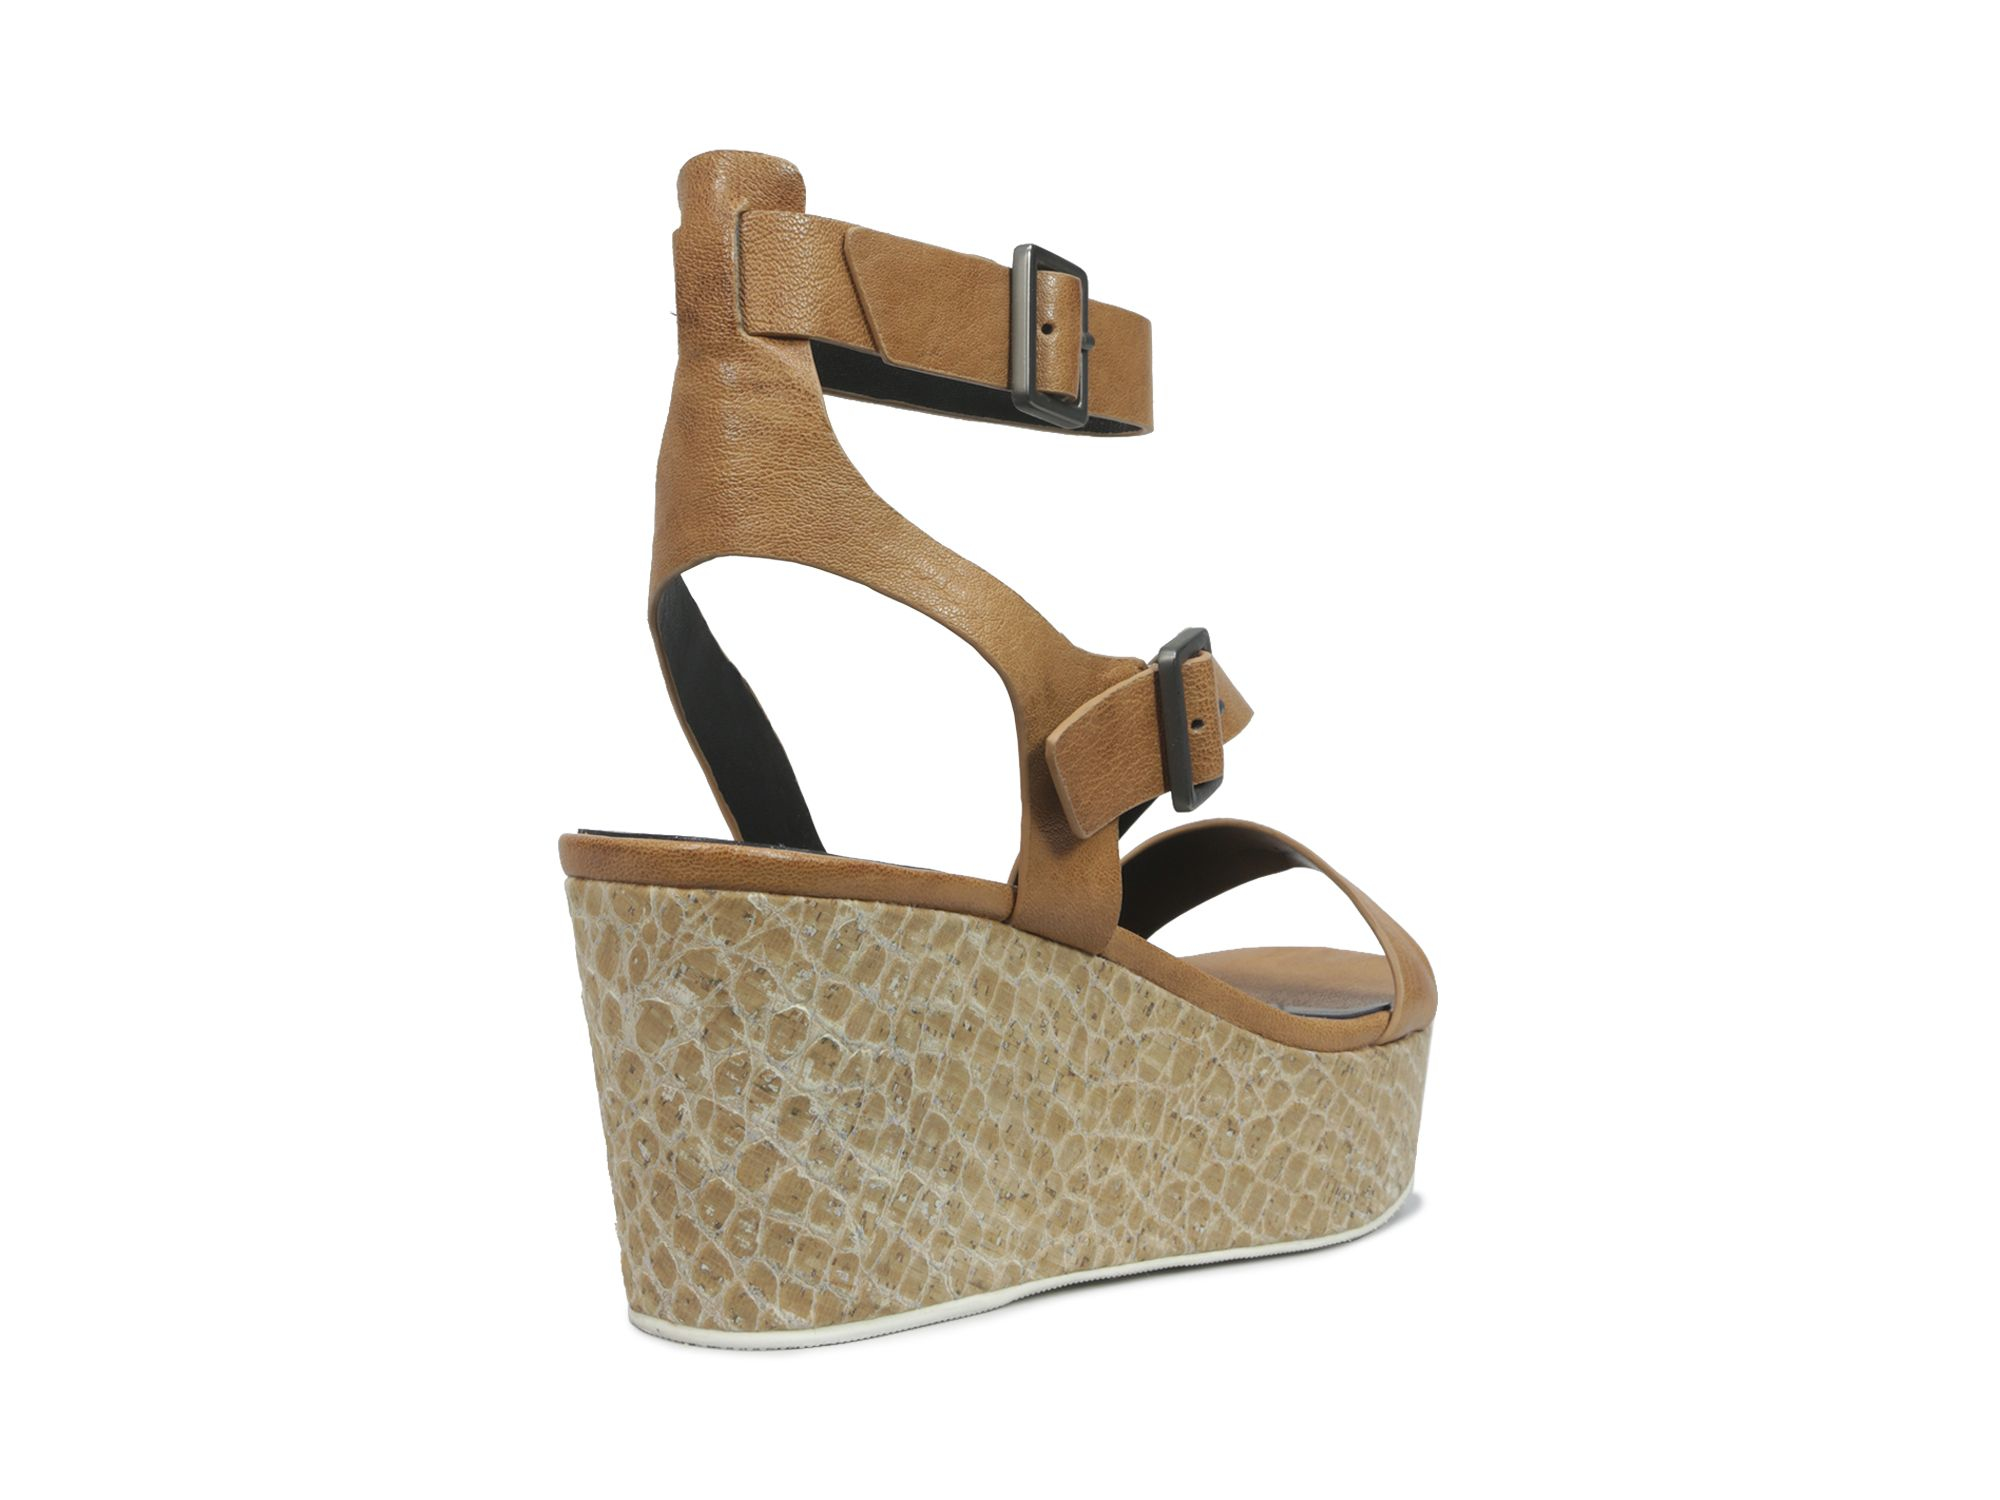 8921063e16a Elie Tahari Open Toe Platform Wedge Sandals - Mustique in Brown - Lyst